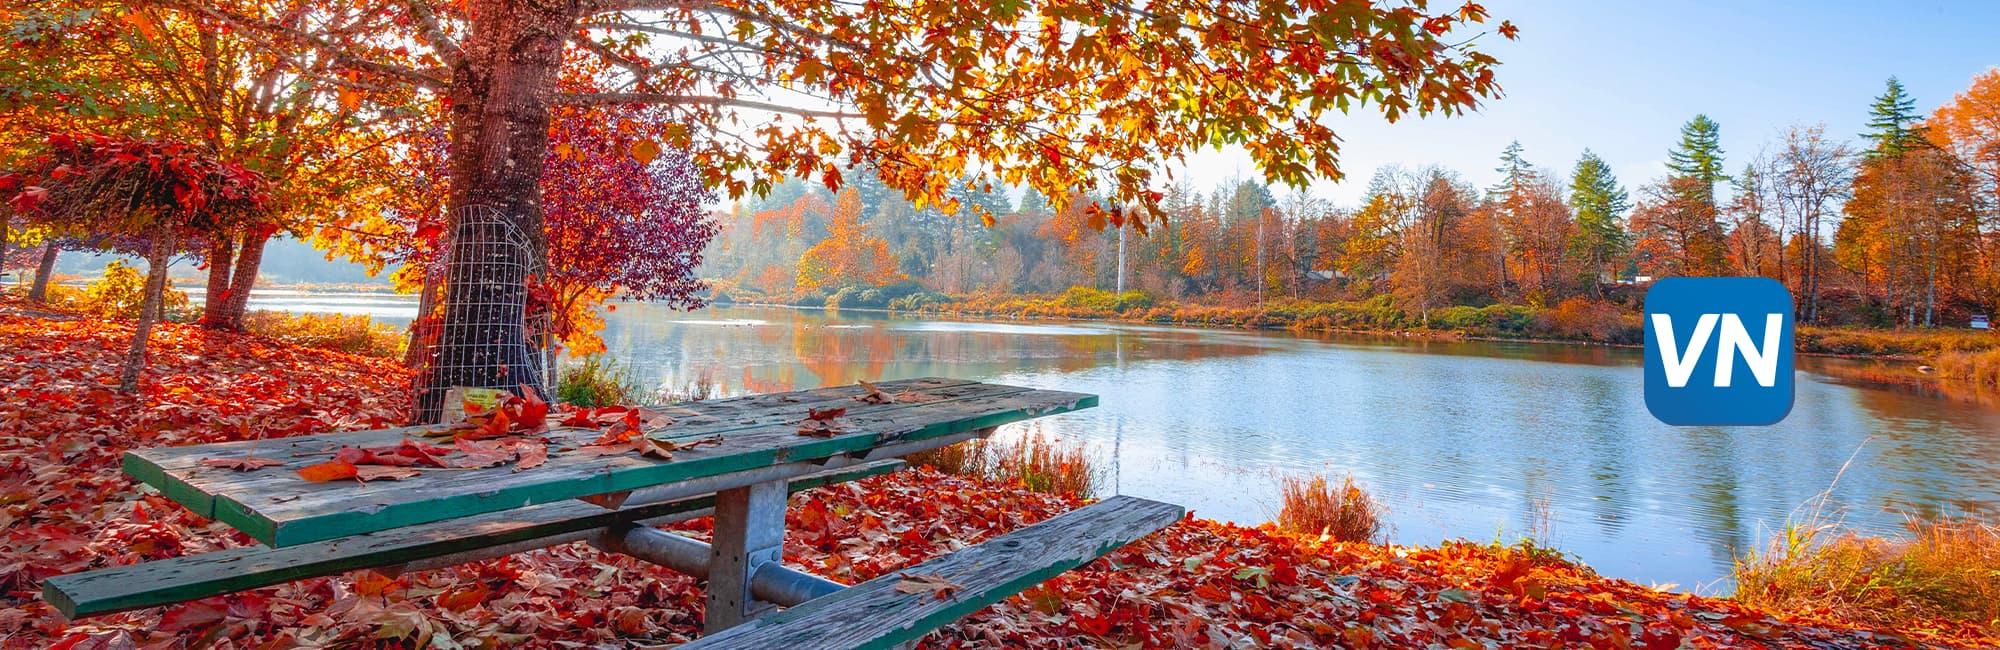 6 ways to enjoy fall!